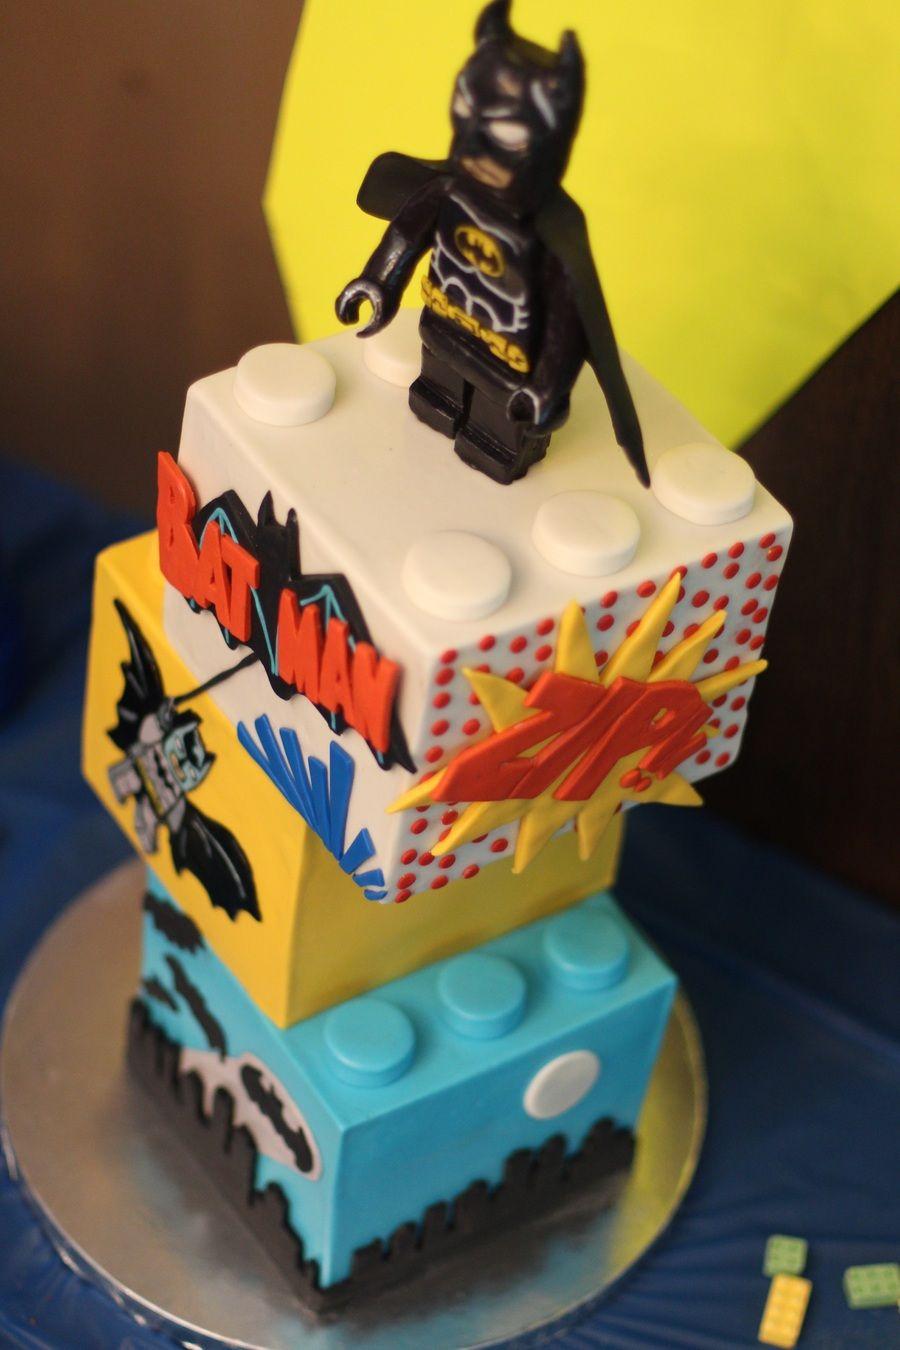 Lego Batman Cake Character Cakes Pinterest Lego Batman Cakes - Lego birthday cake decorations